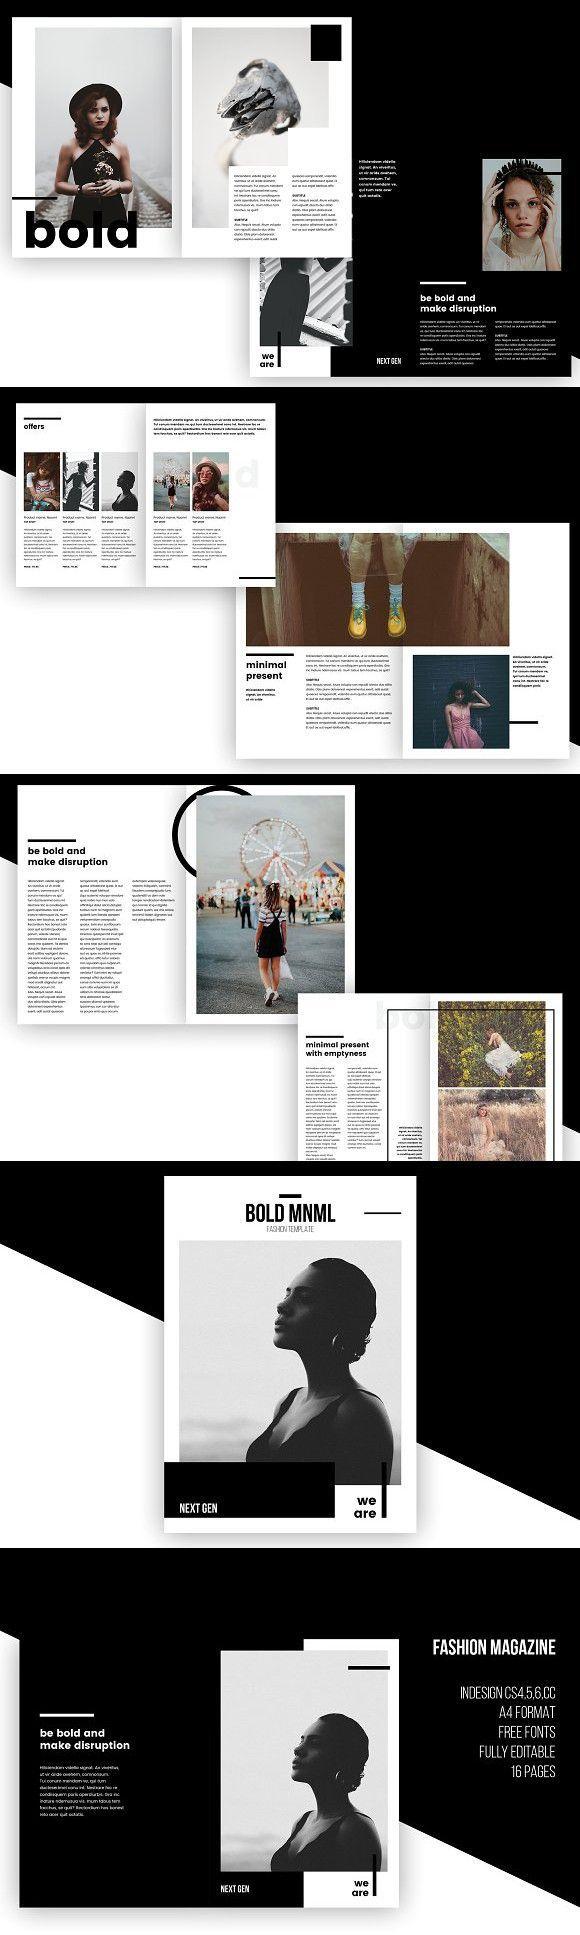 Fashion Magazine - InDesign Template